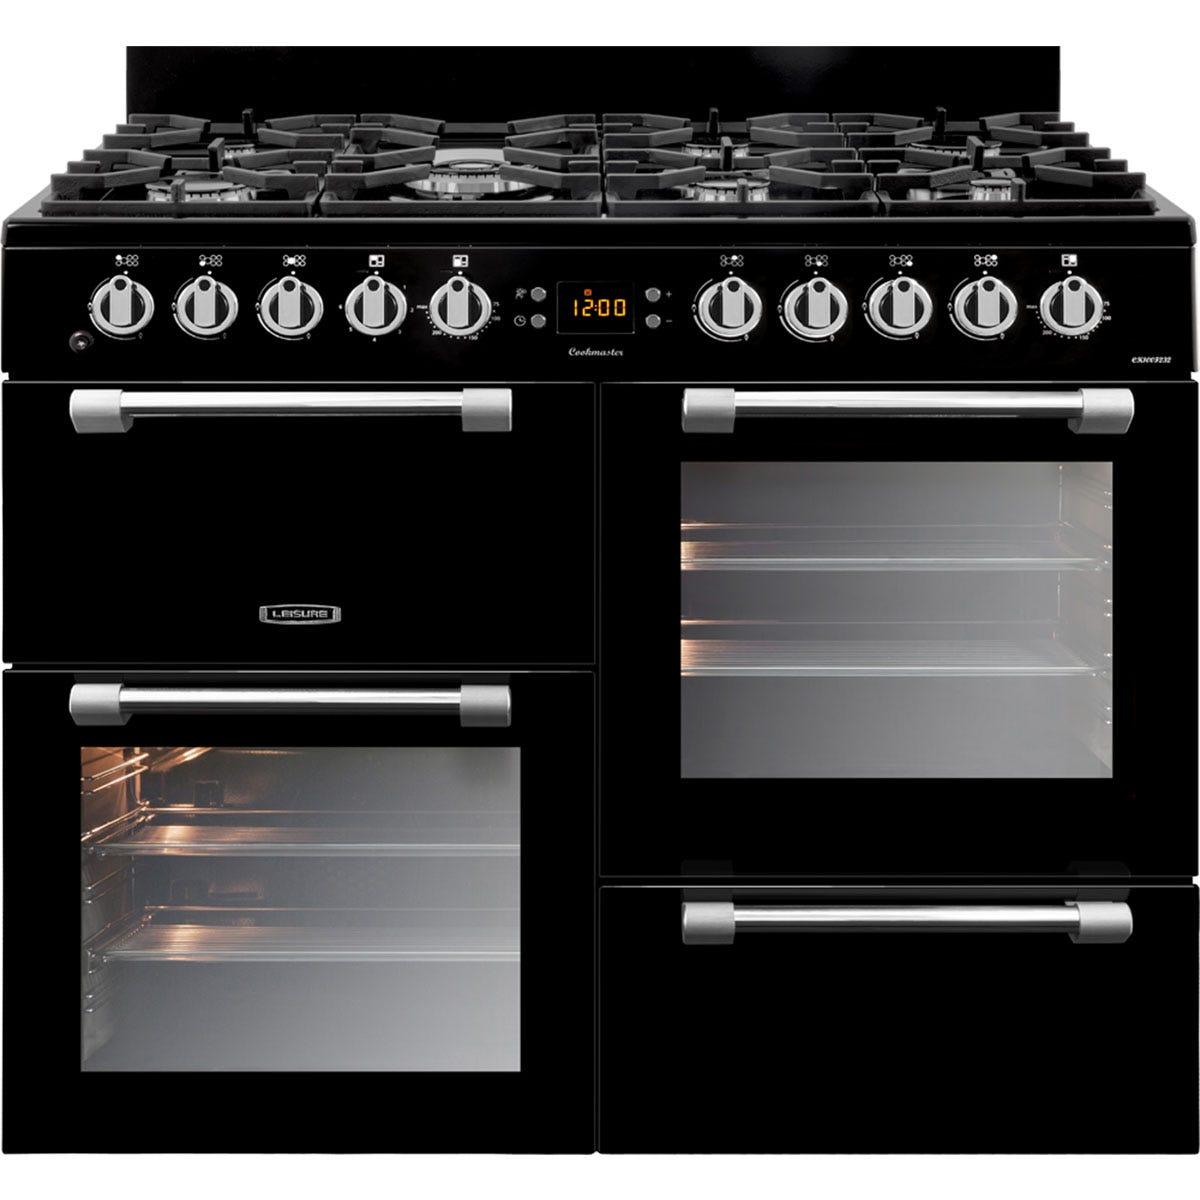 Leisure CK100F232K 100cm Cookmaster Dual Fuel Range Cooker - Black